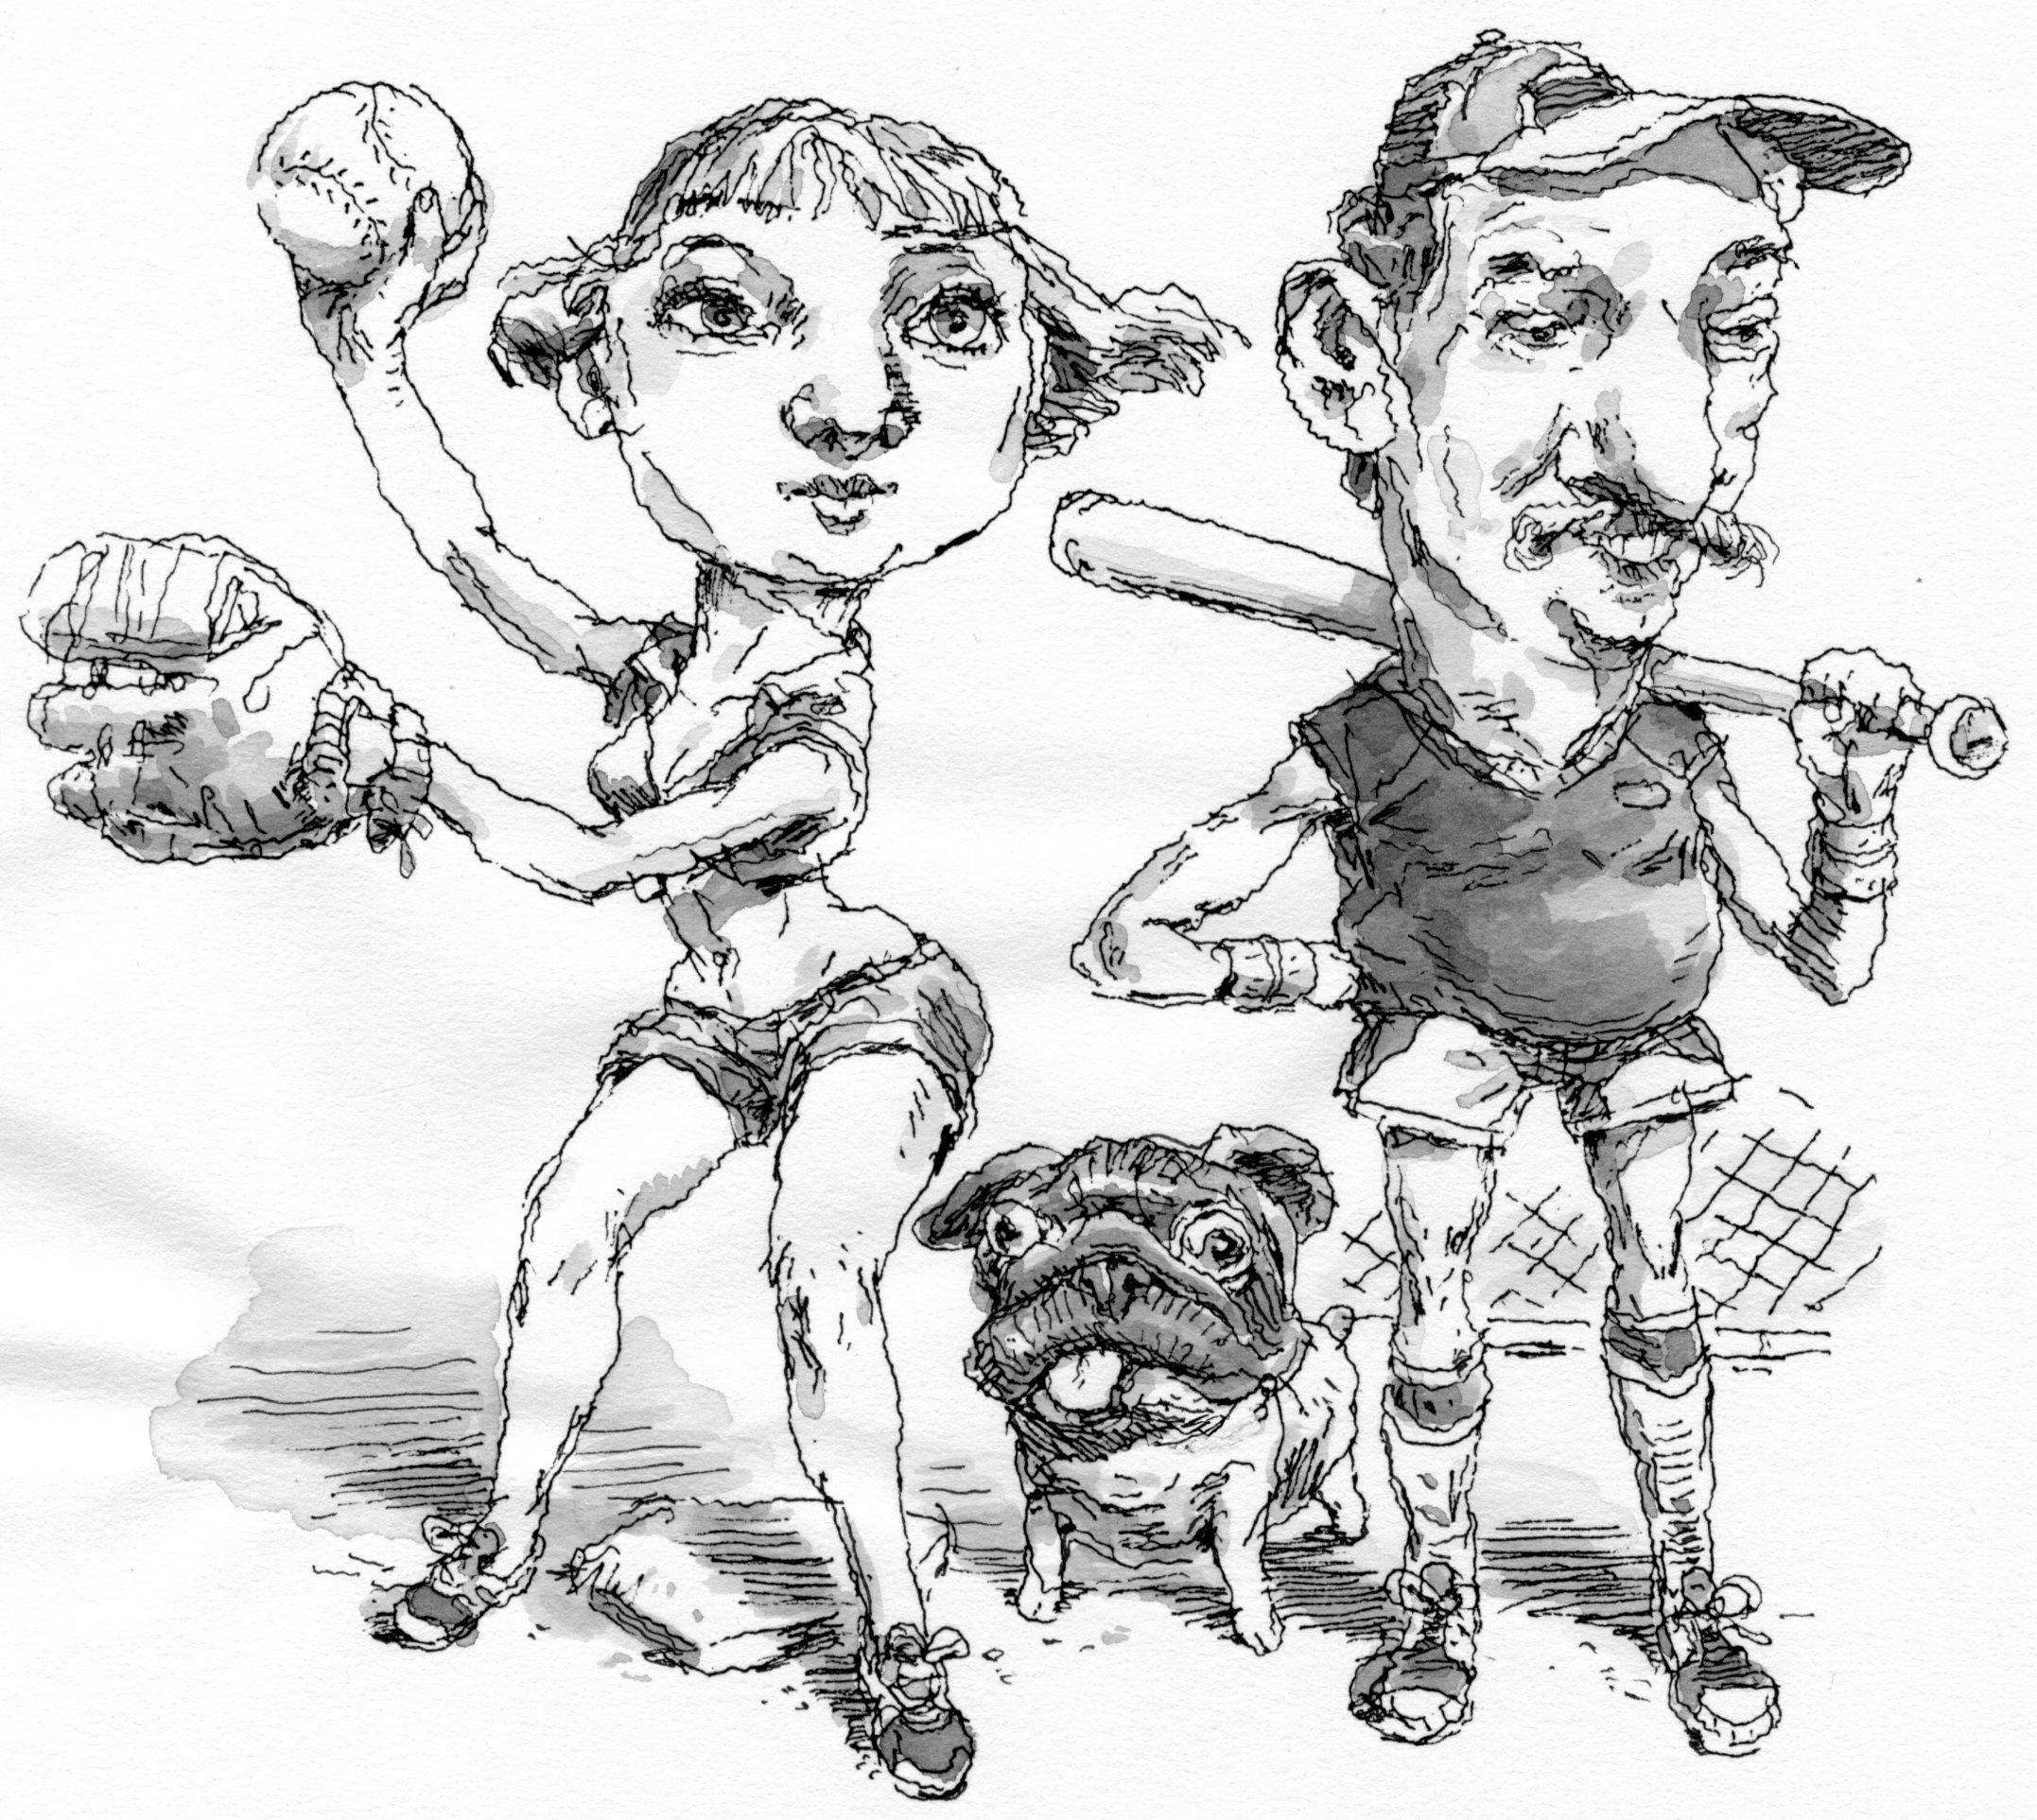 Drawing by John Cuneo